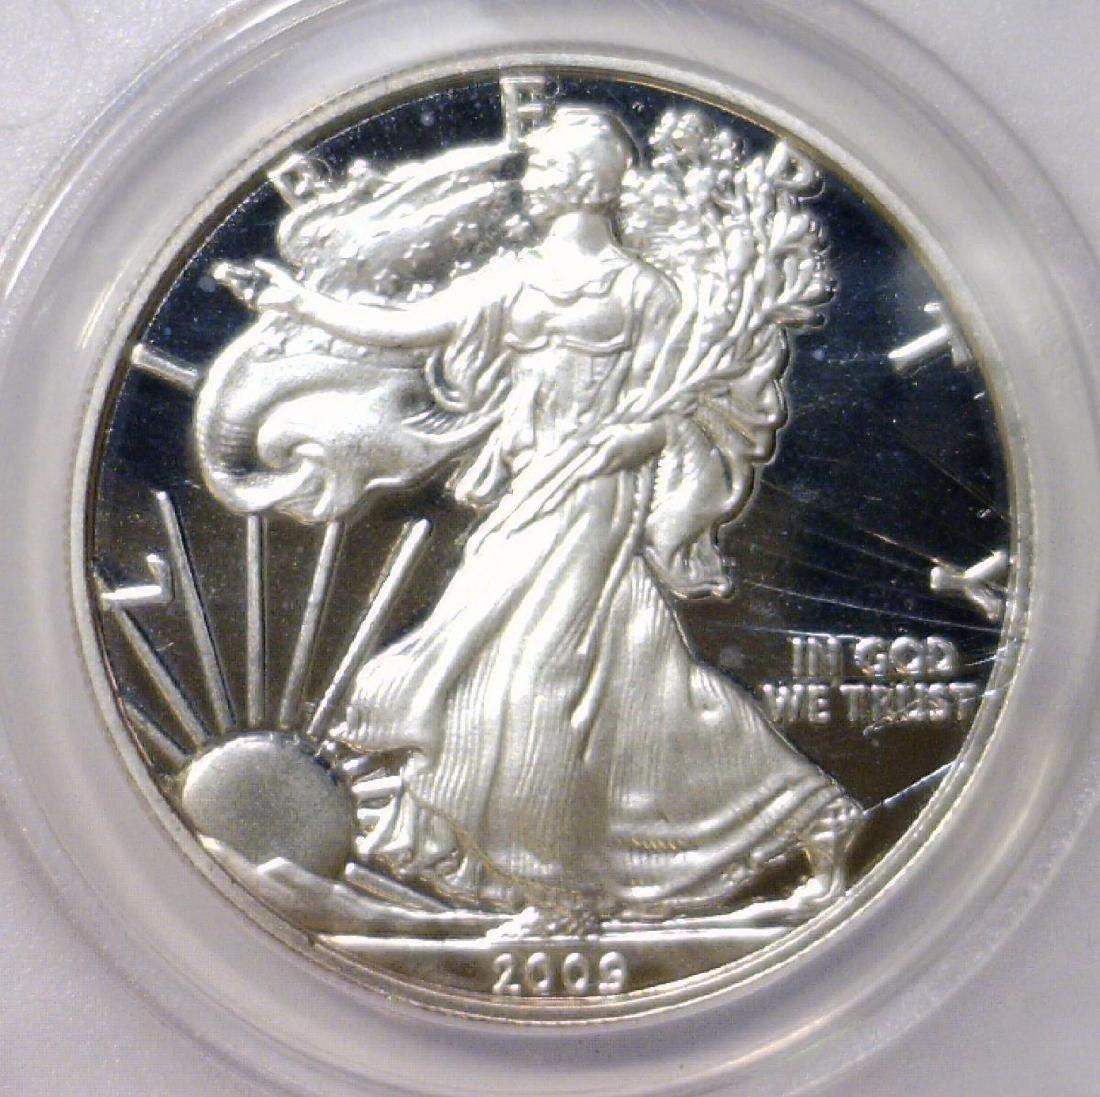 2009-DC Silver Eagle Daniel Carr Proof Overstrike - 2